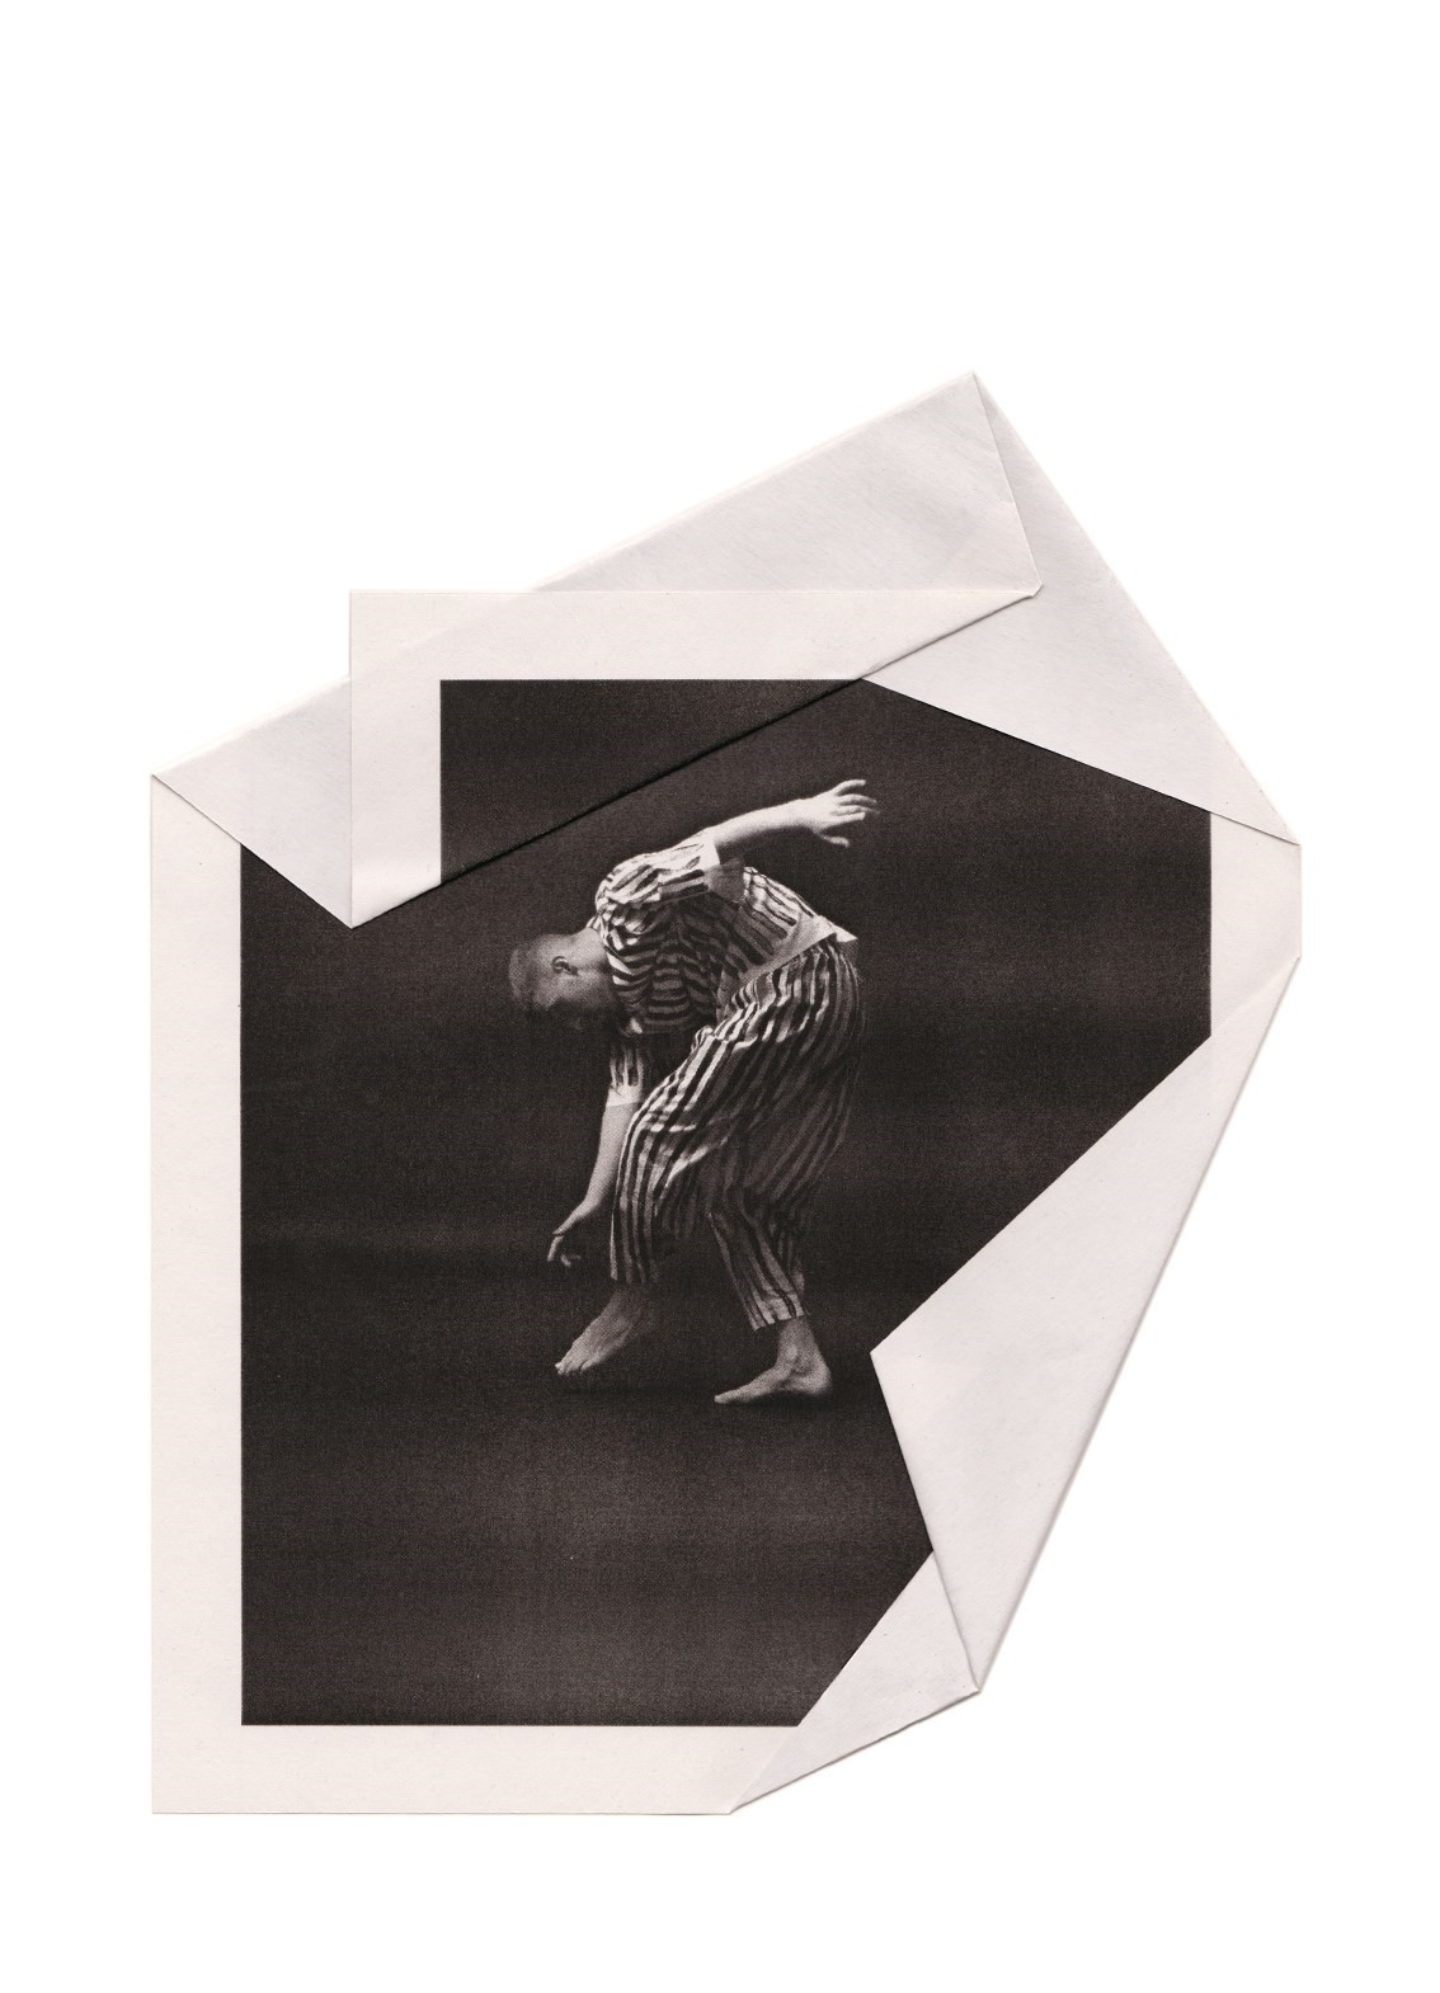 IGNANT-Art-Paul-Phung-Bruce-Usher-Dance-9